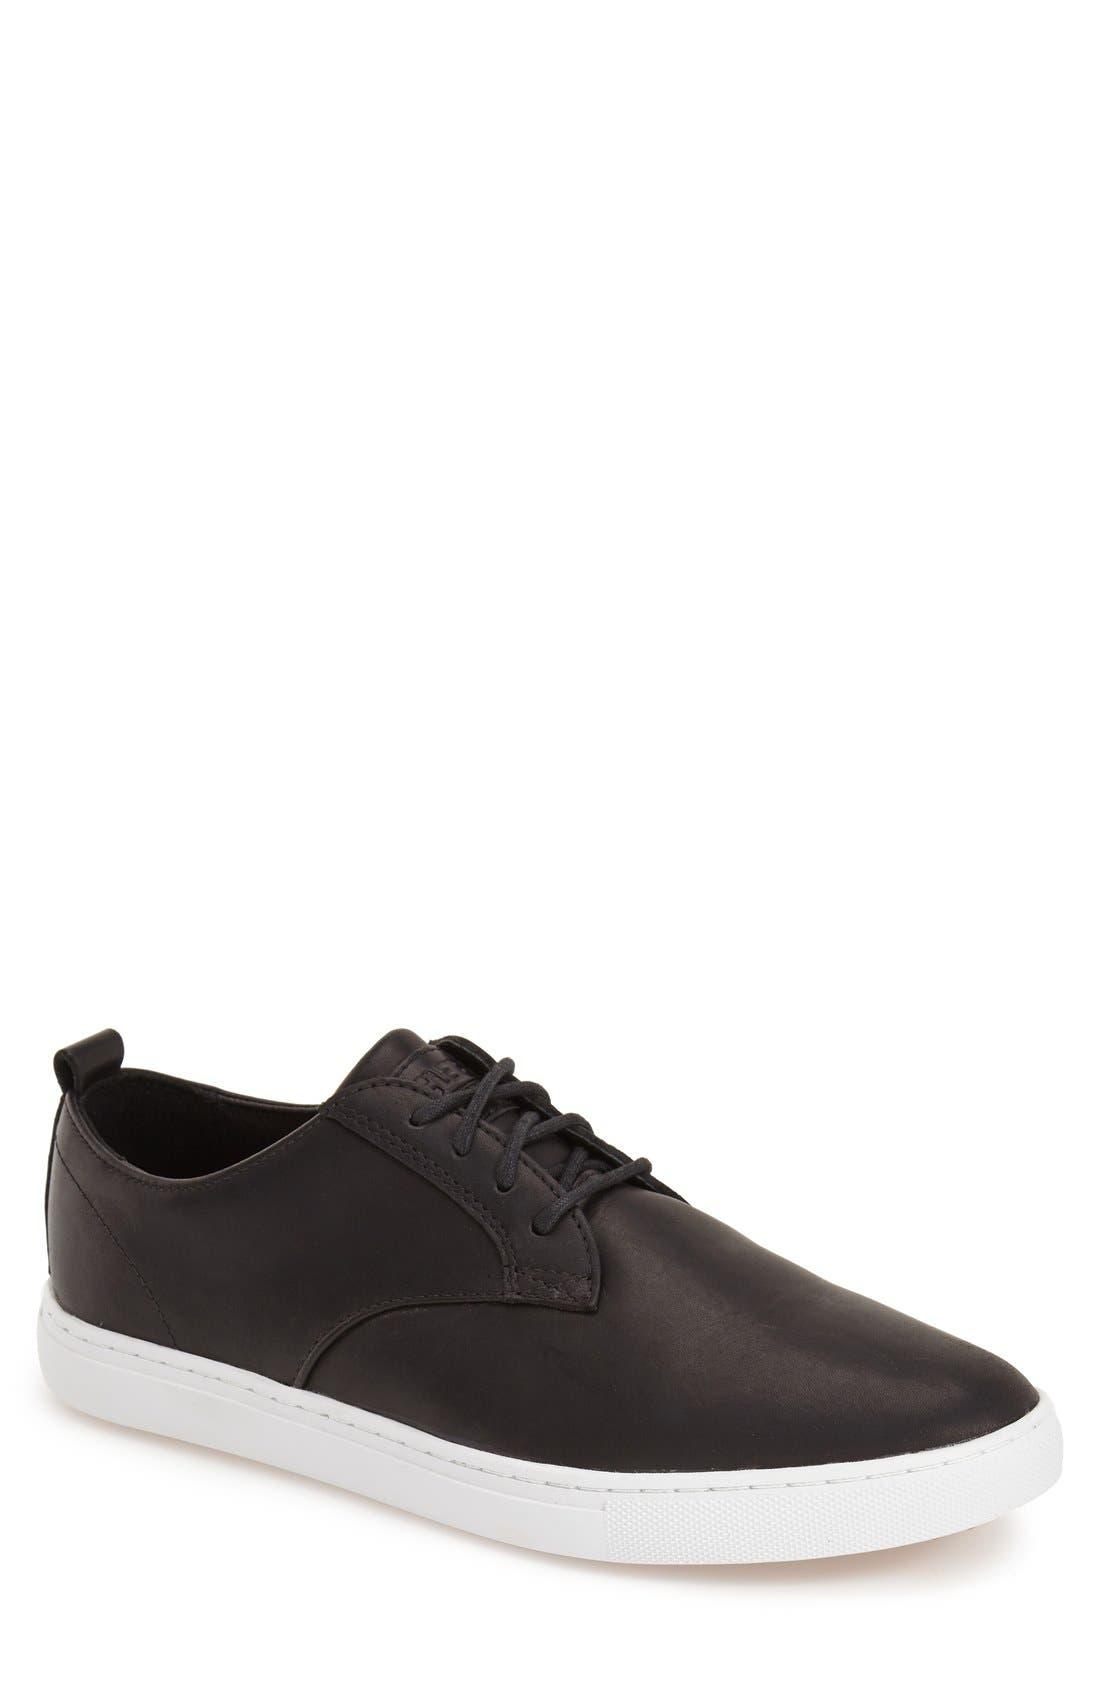 'Ellington' Sneaker,                         Main,                         color, 012